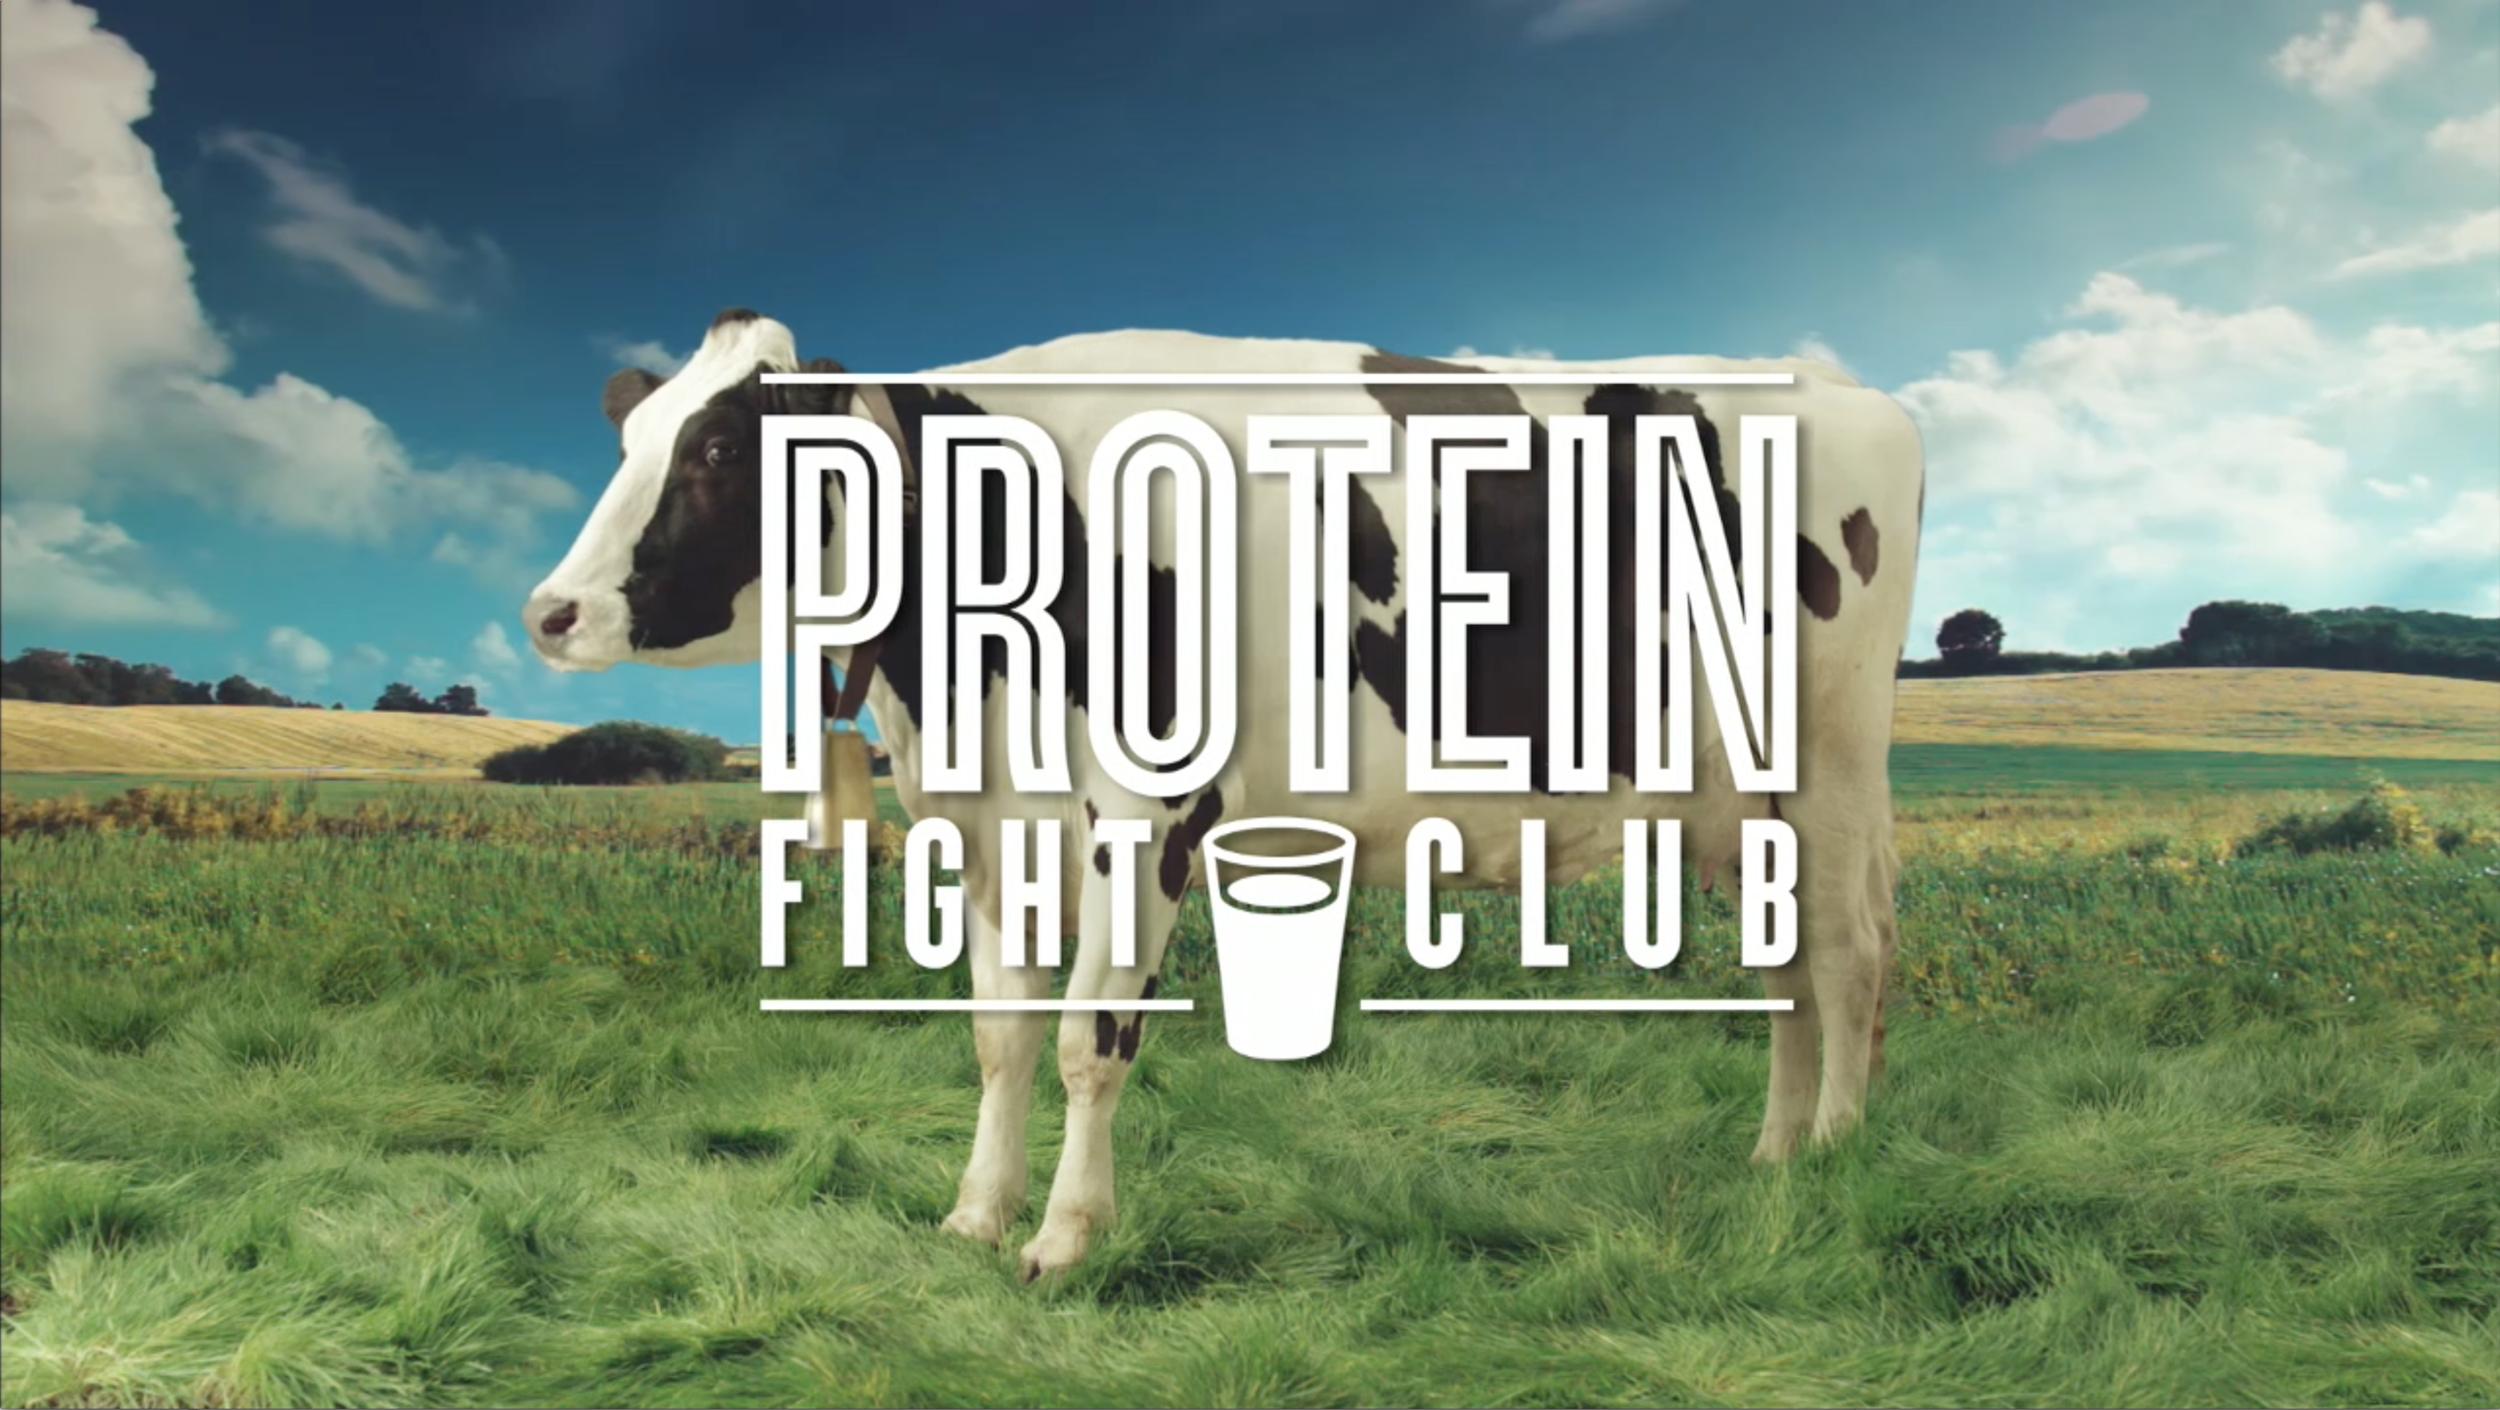 ProteinFightClub